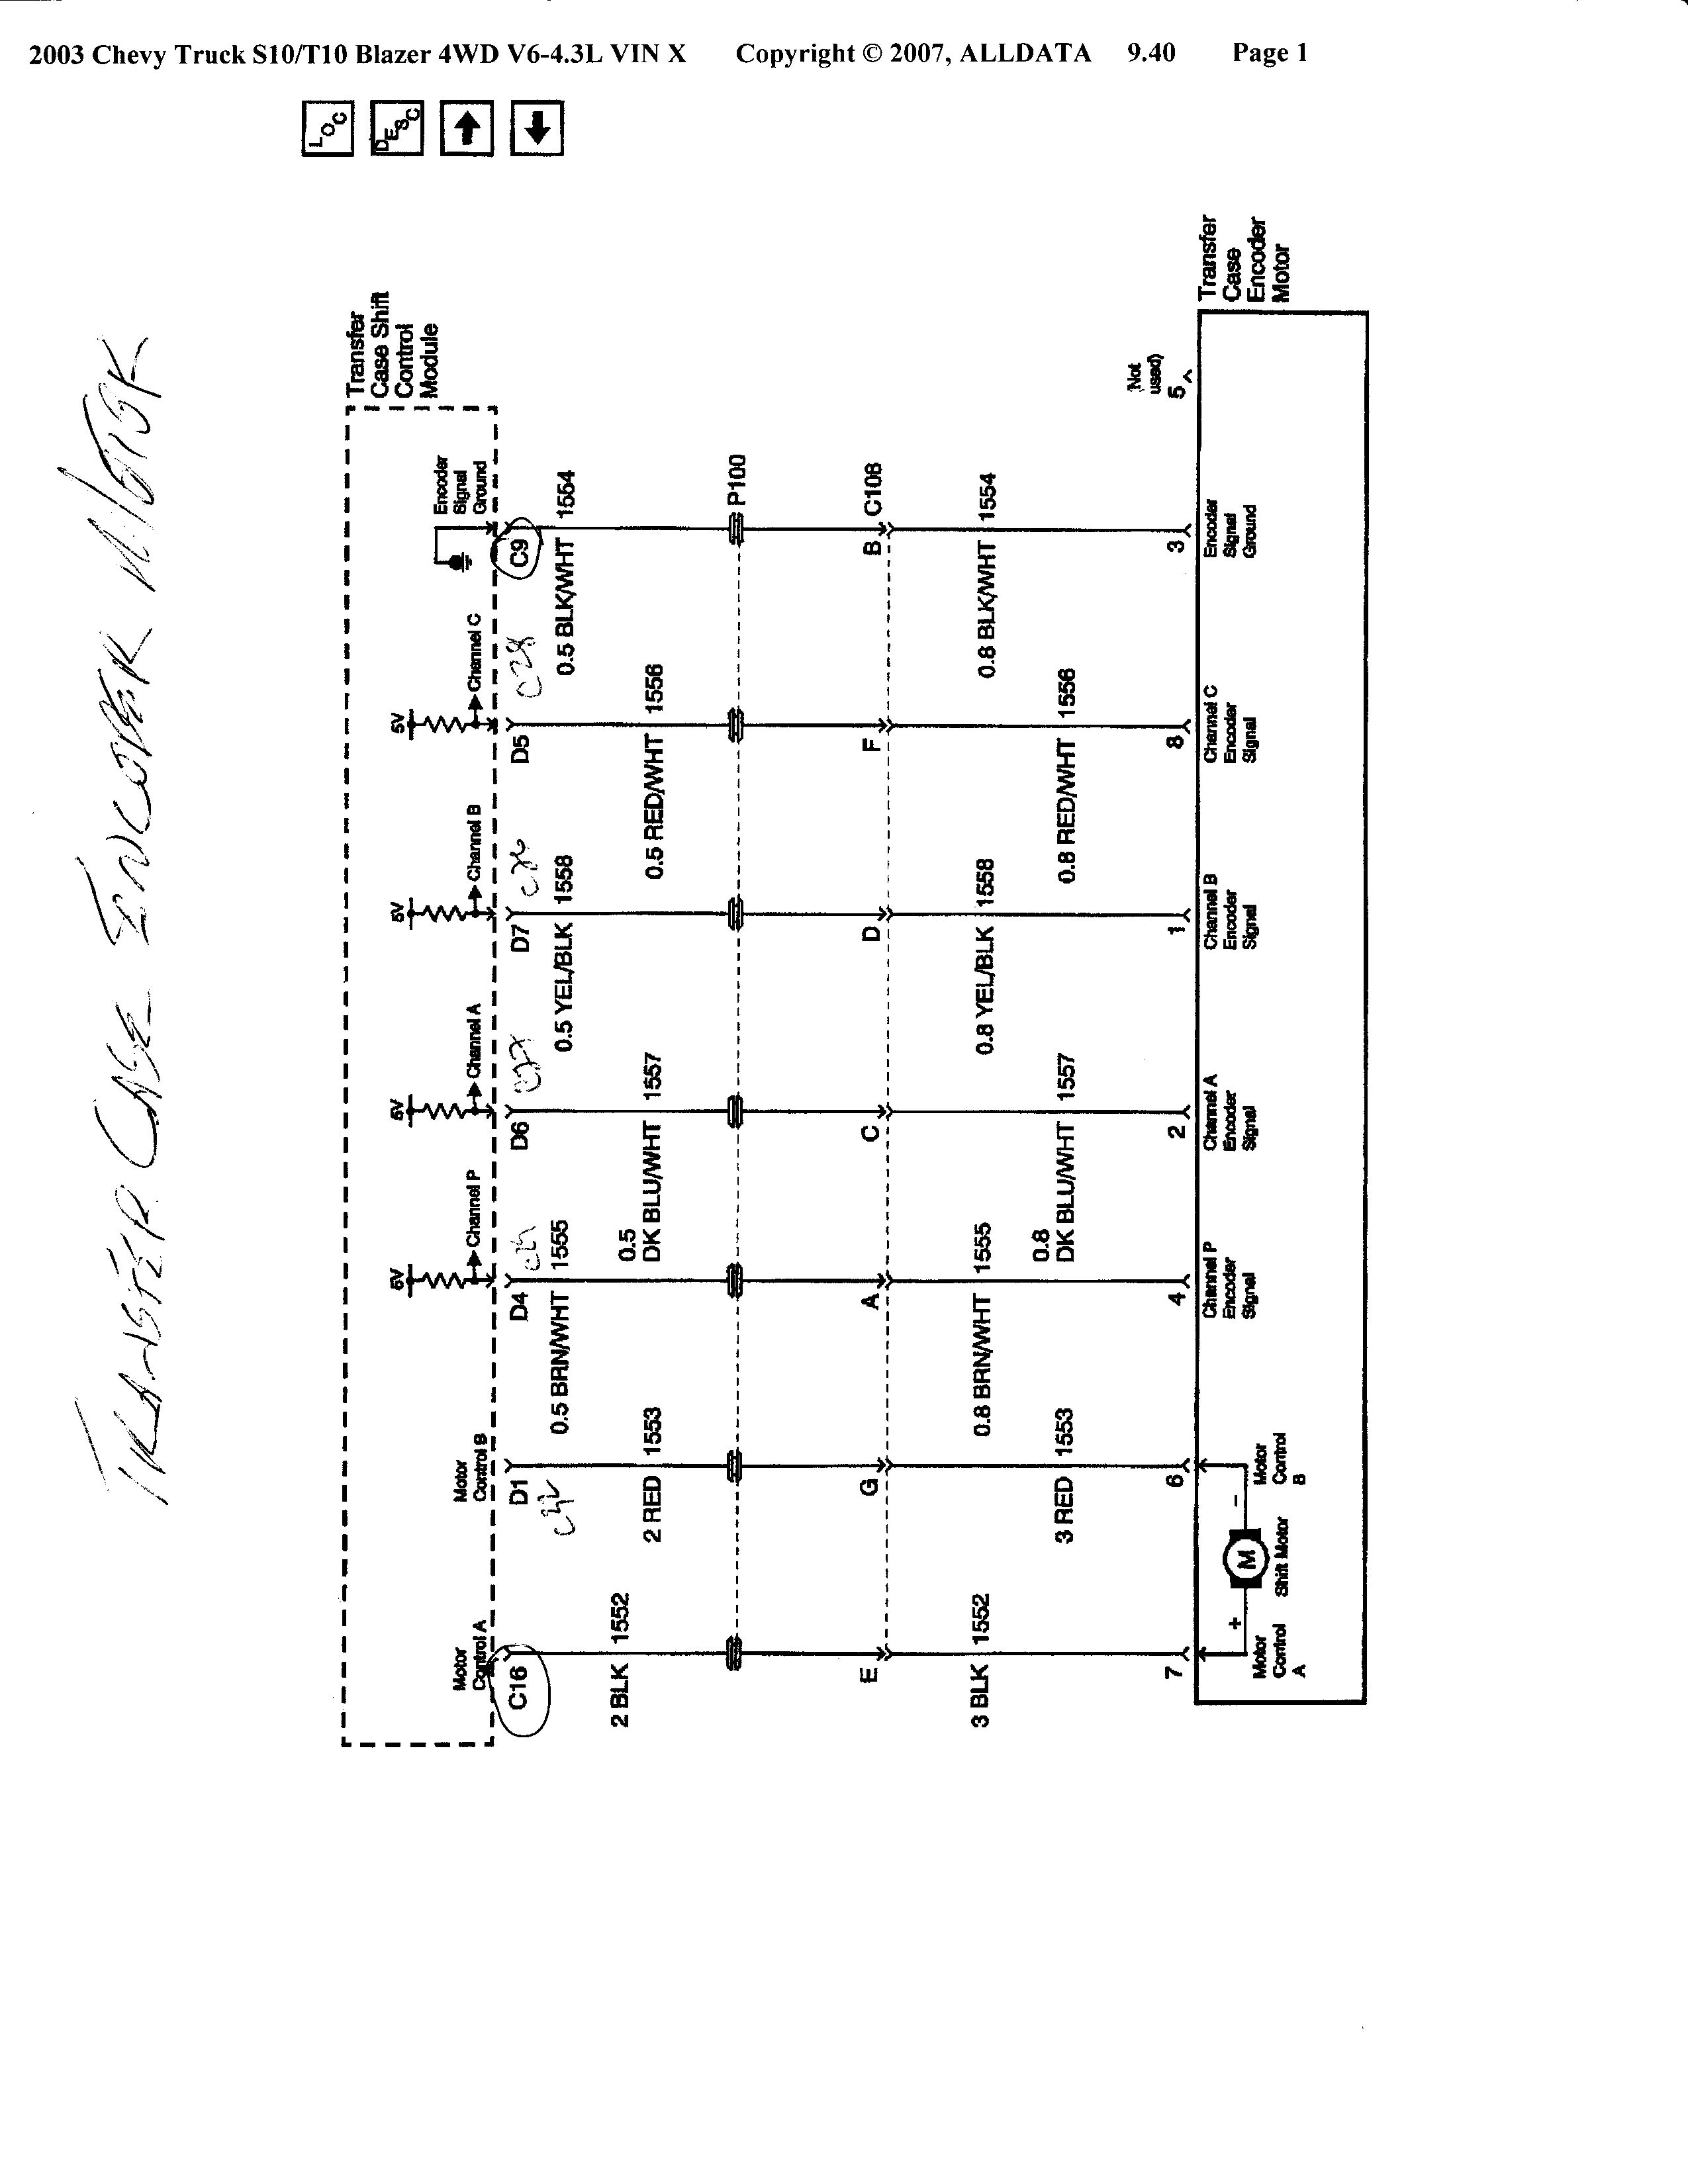 1994 s10 wiring diagram 4x4